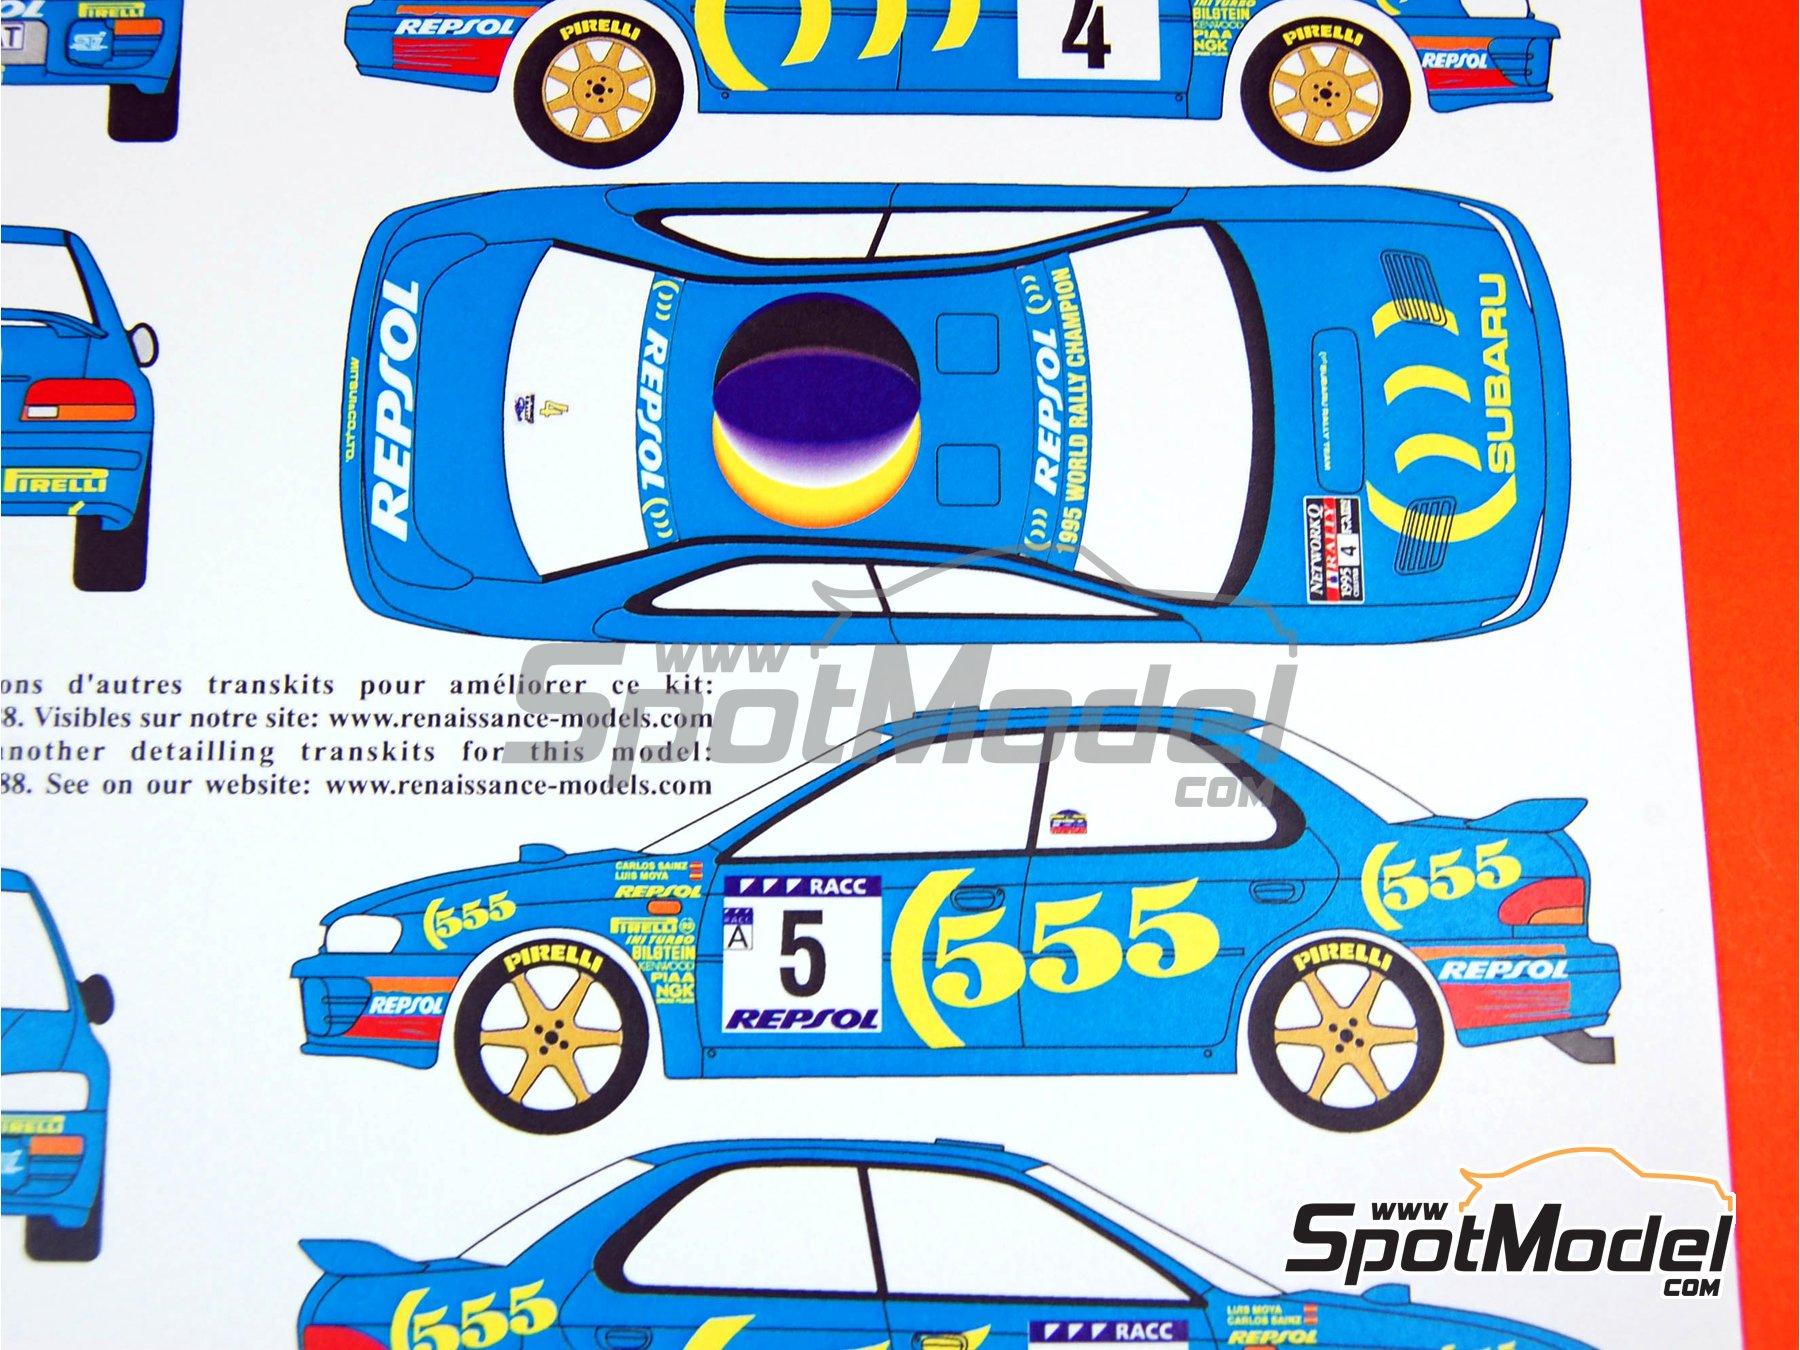 Image 4: Subaru Impreza 555 Group A - Catalunya Costa Dorada RACC Rally, RAC Rally 1995 | Marking / livery in 1/24 scale manufactured by Renaissance Models (ref.TK24-289)